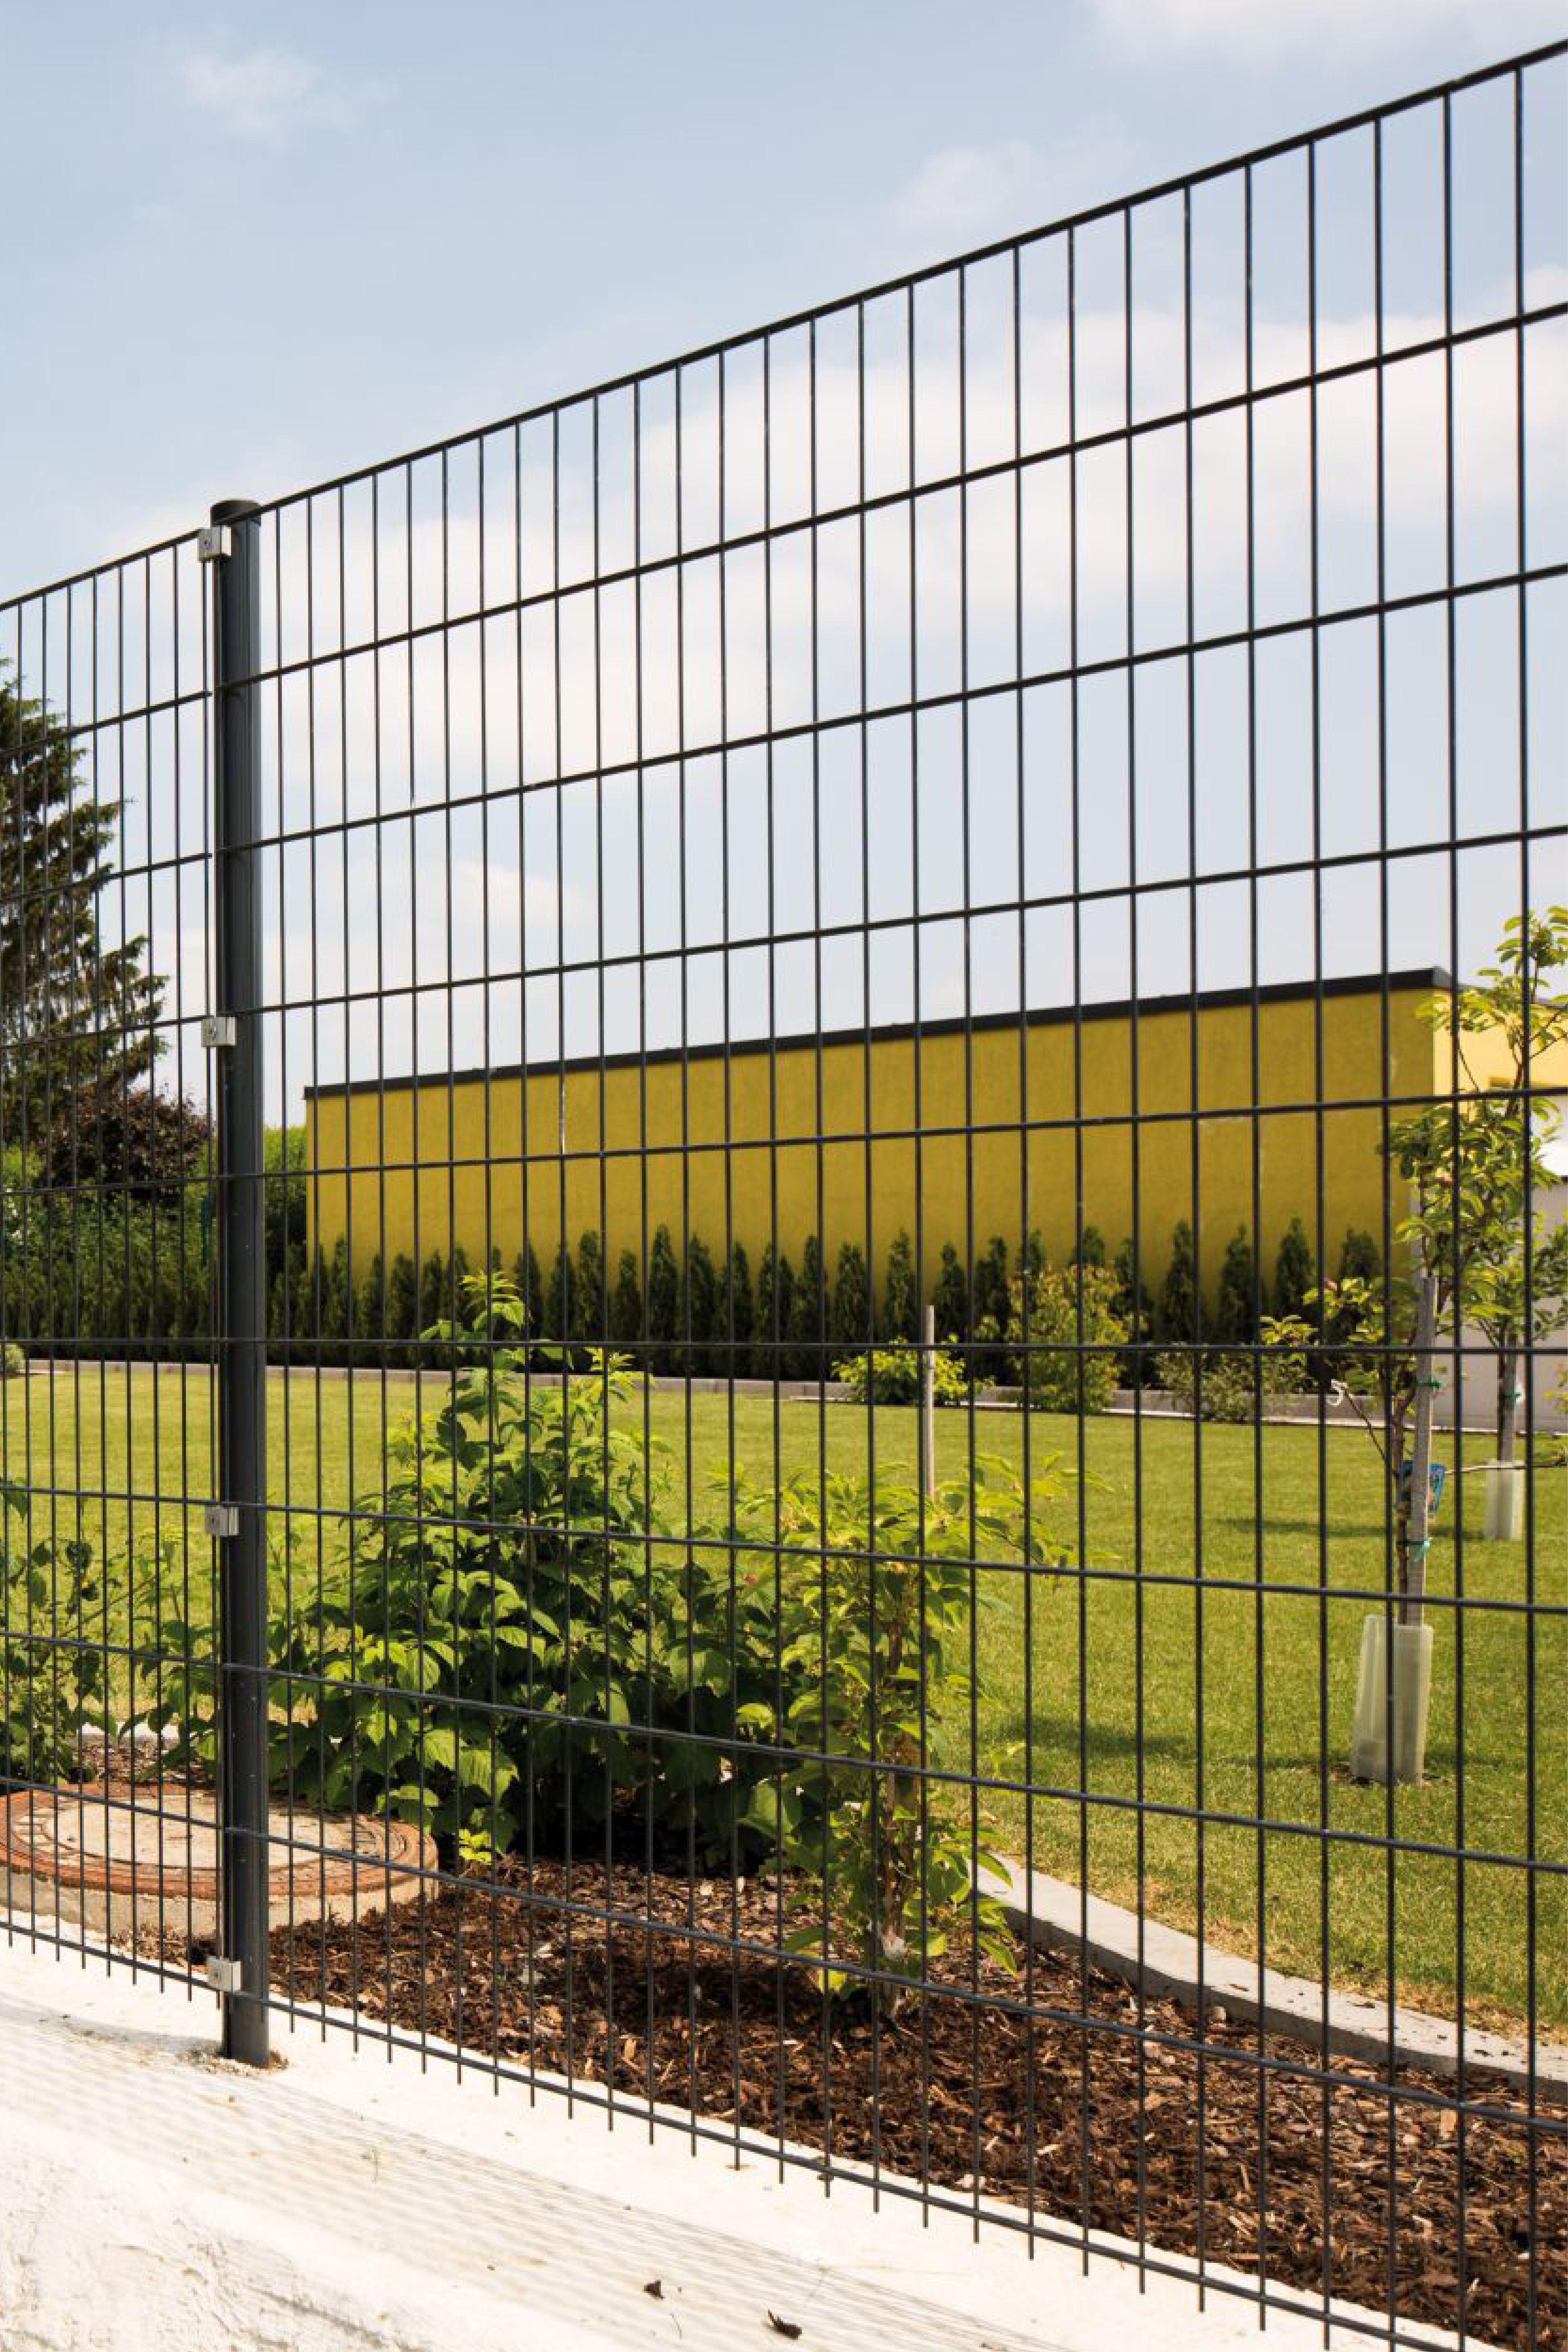 Zaunidee Einfacher Aufbau Doppelstabmatte In 2020 Doppelstabmattenzaun Zaun Zaun Ideen